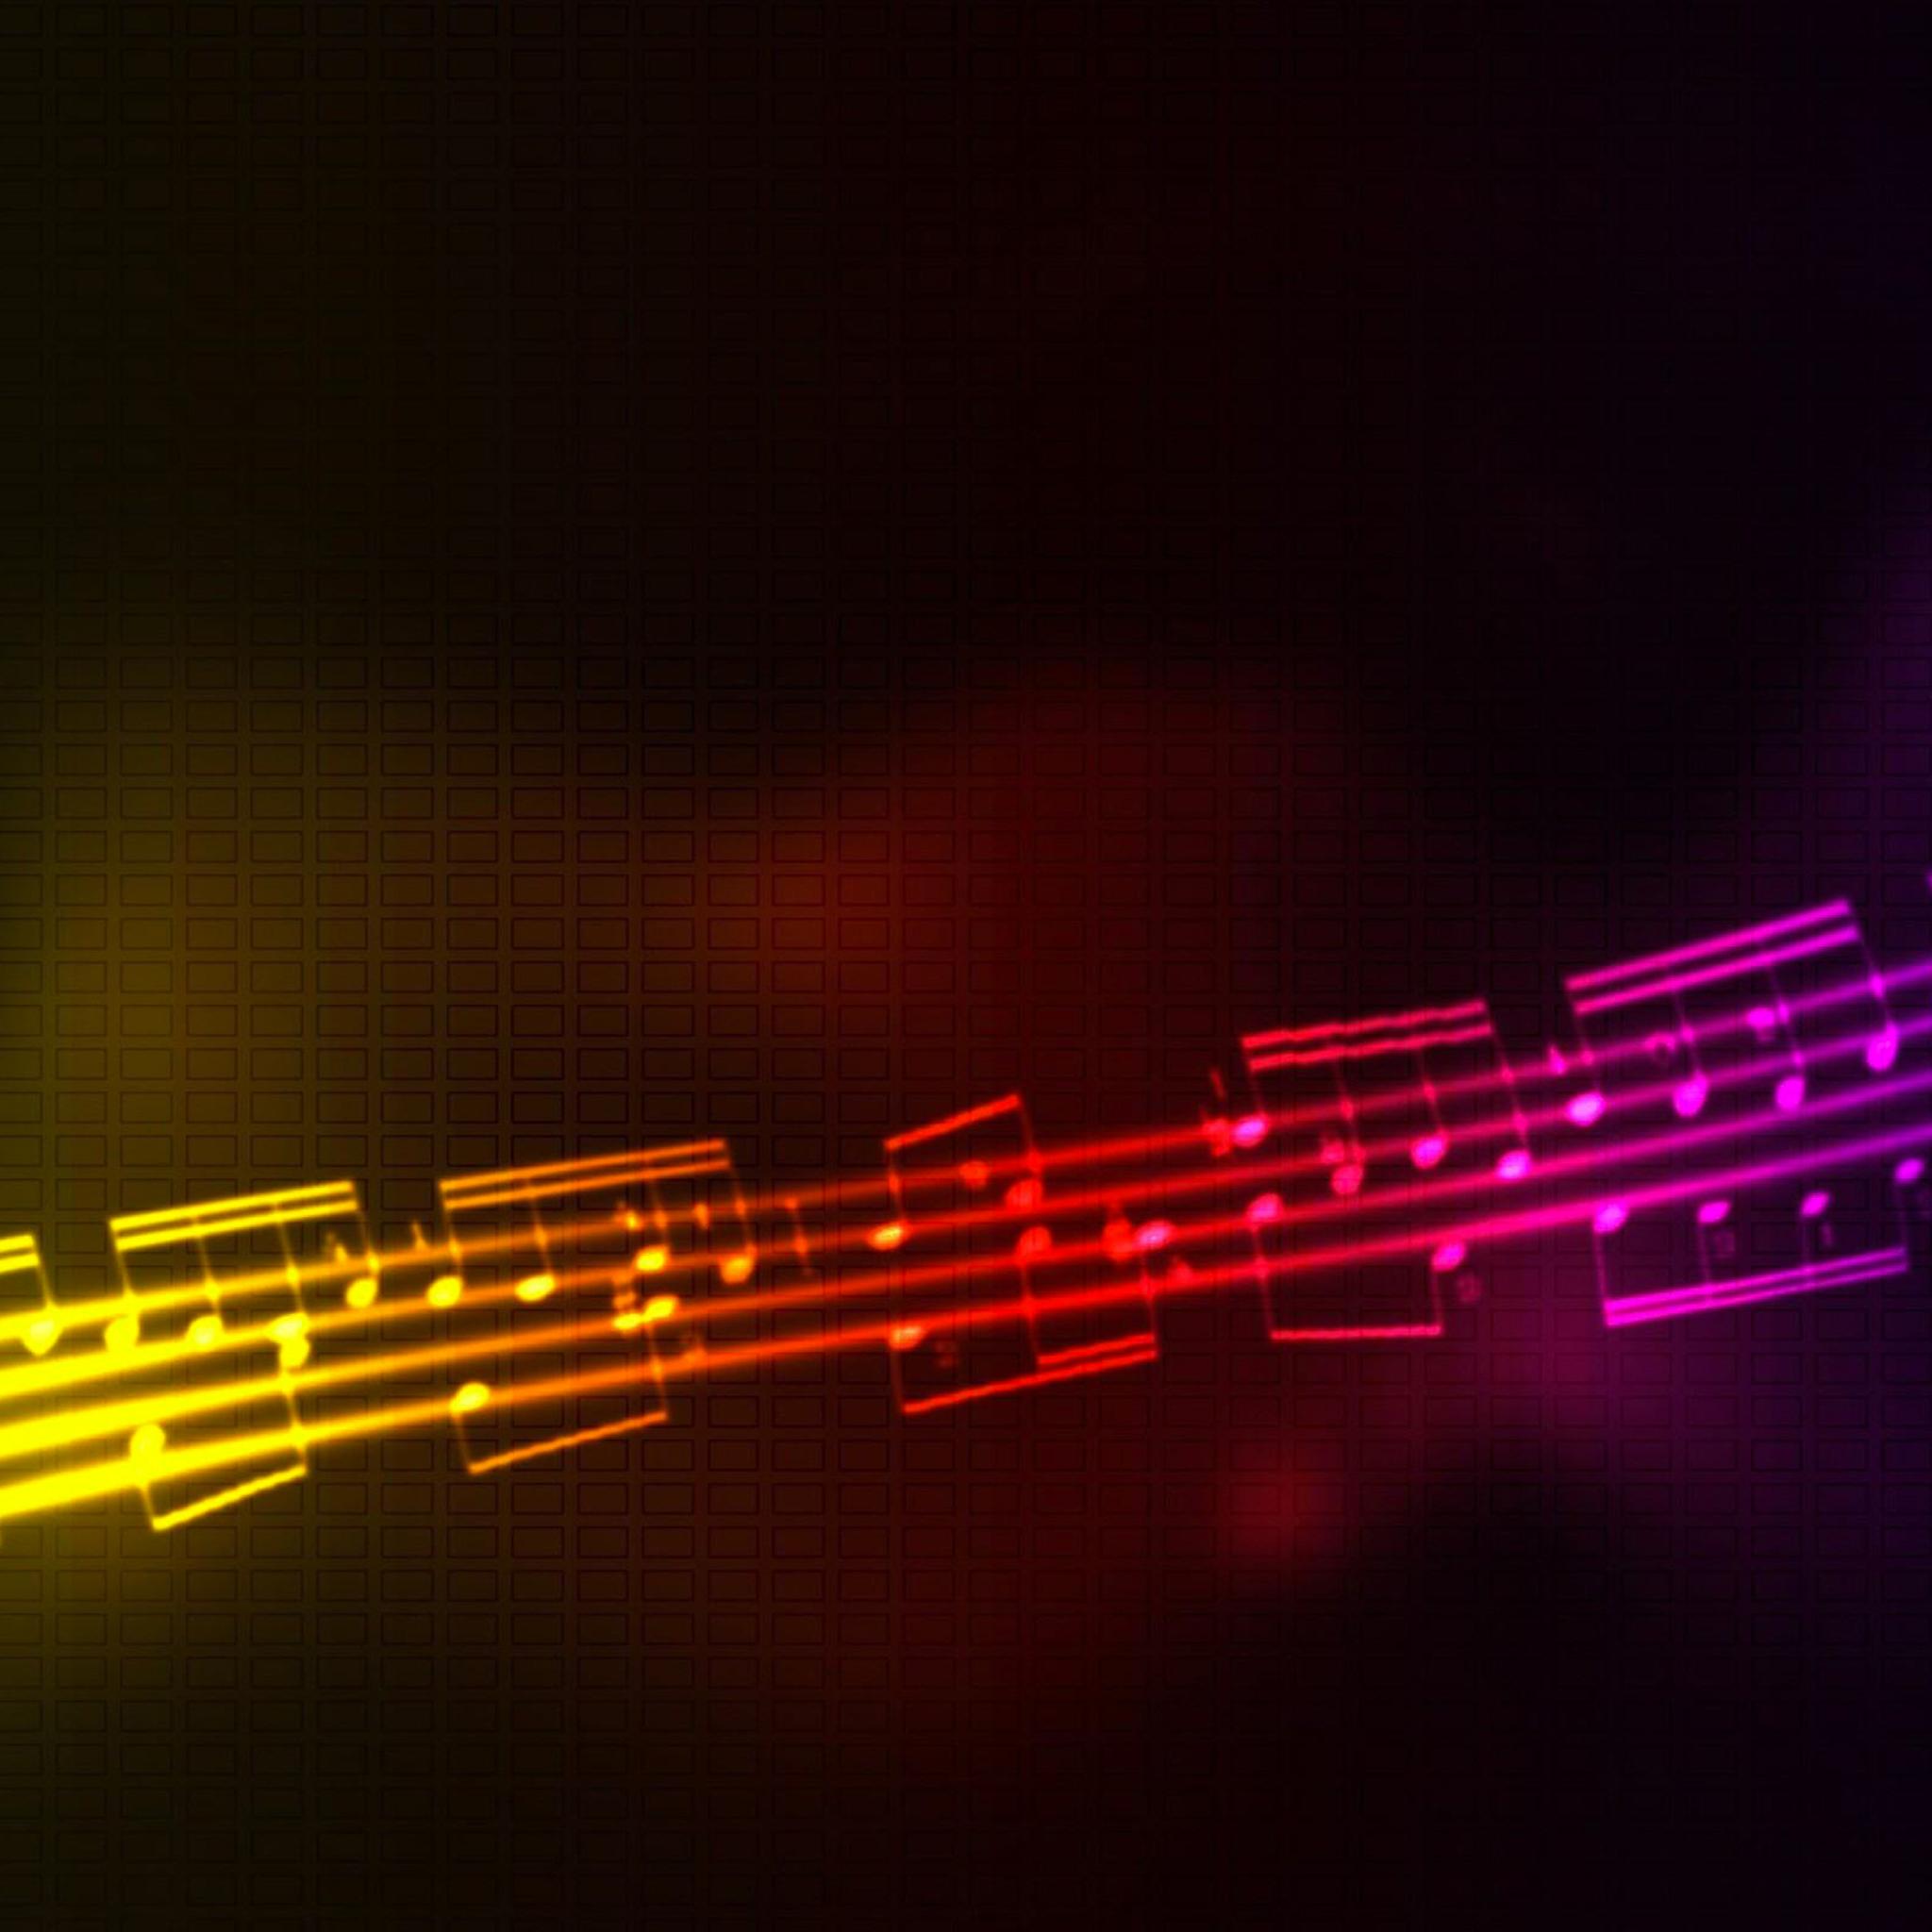 Music Multicolor 3Wallpapers iPad Music Multicolor   iPad